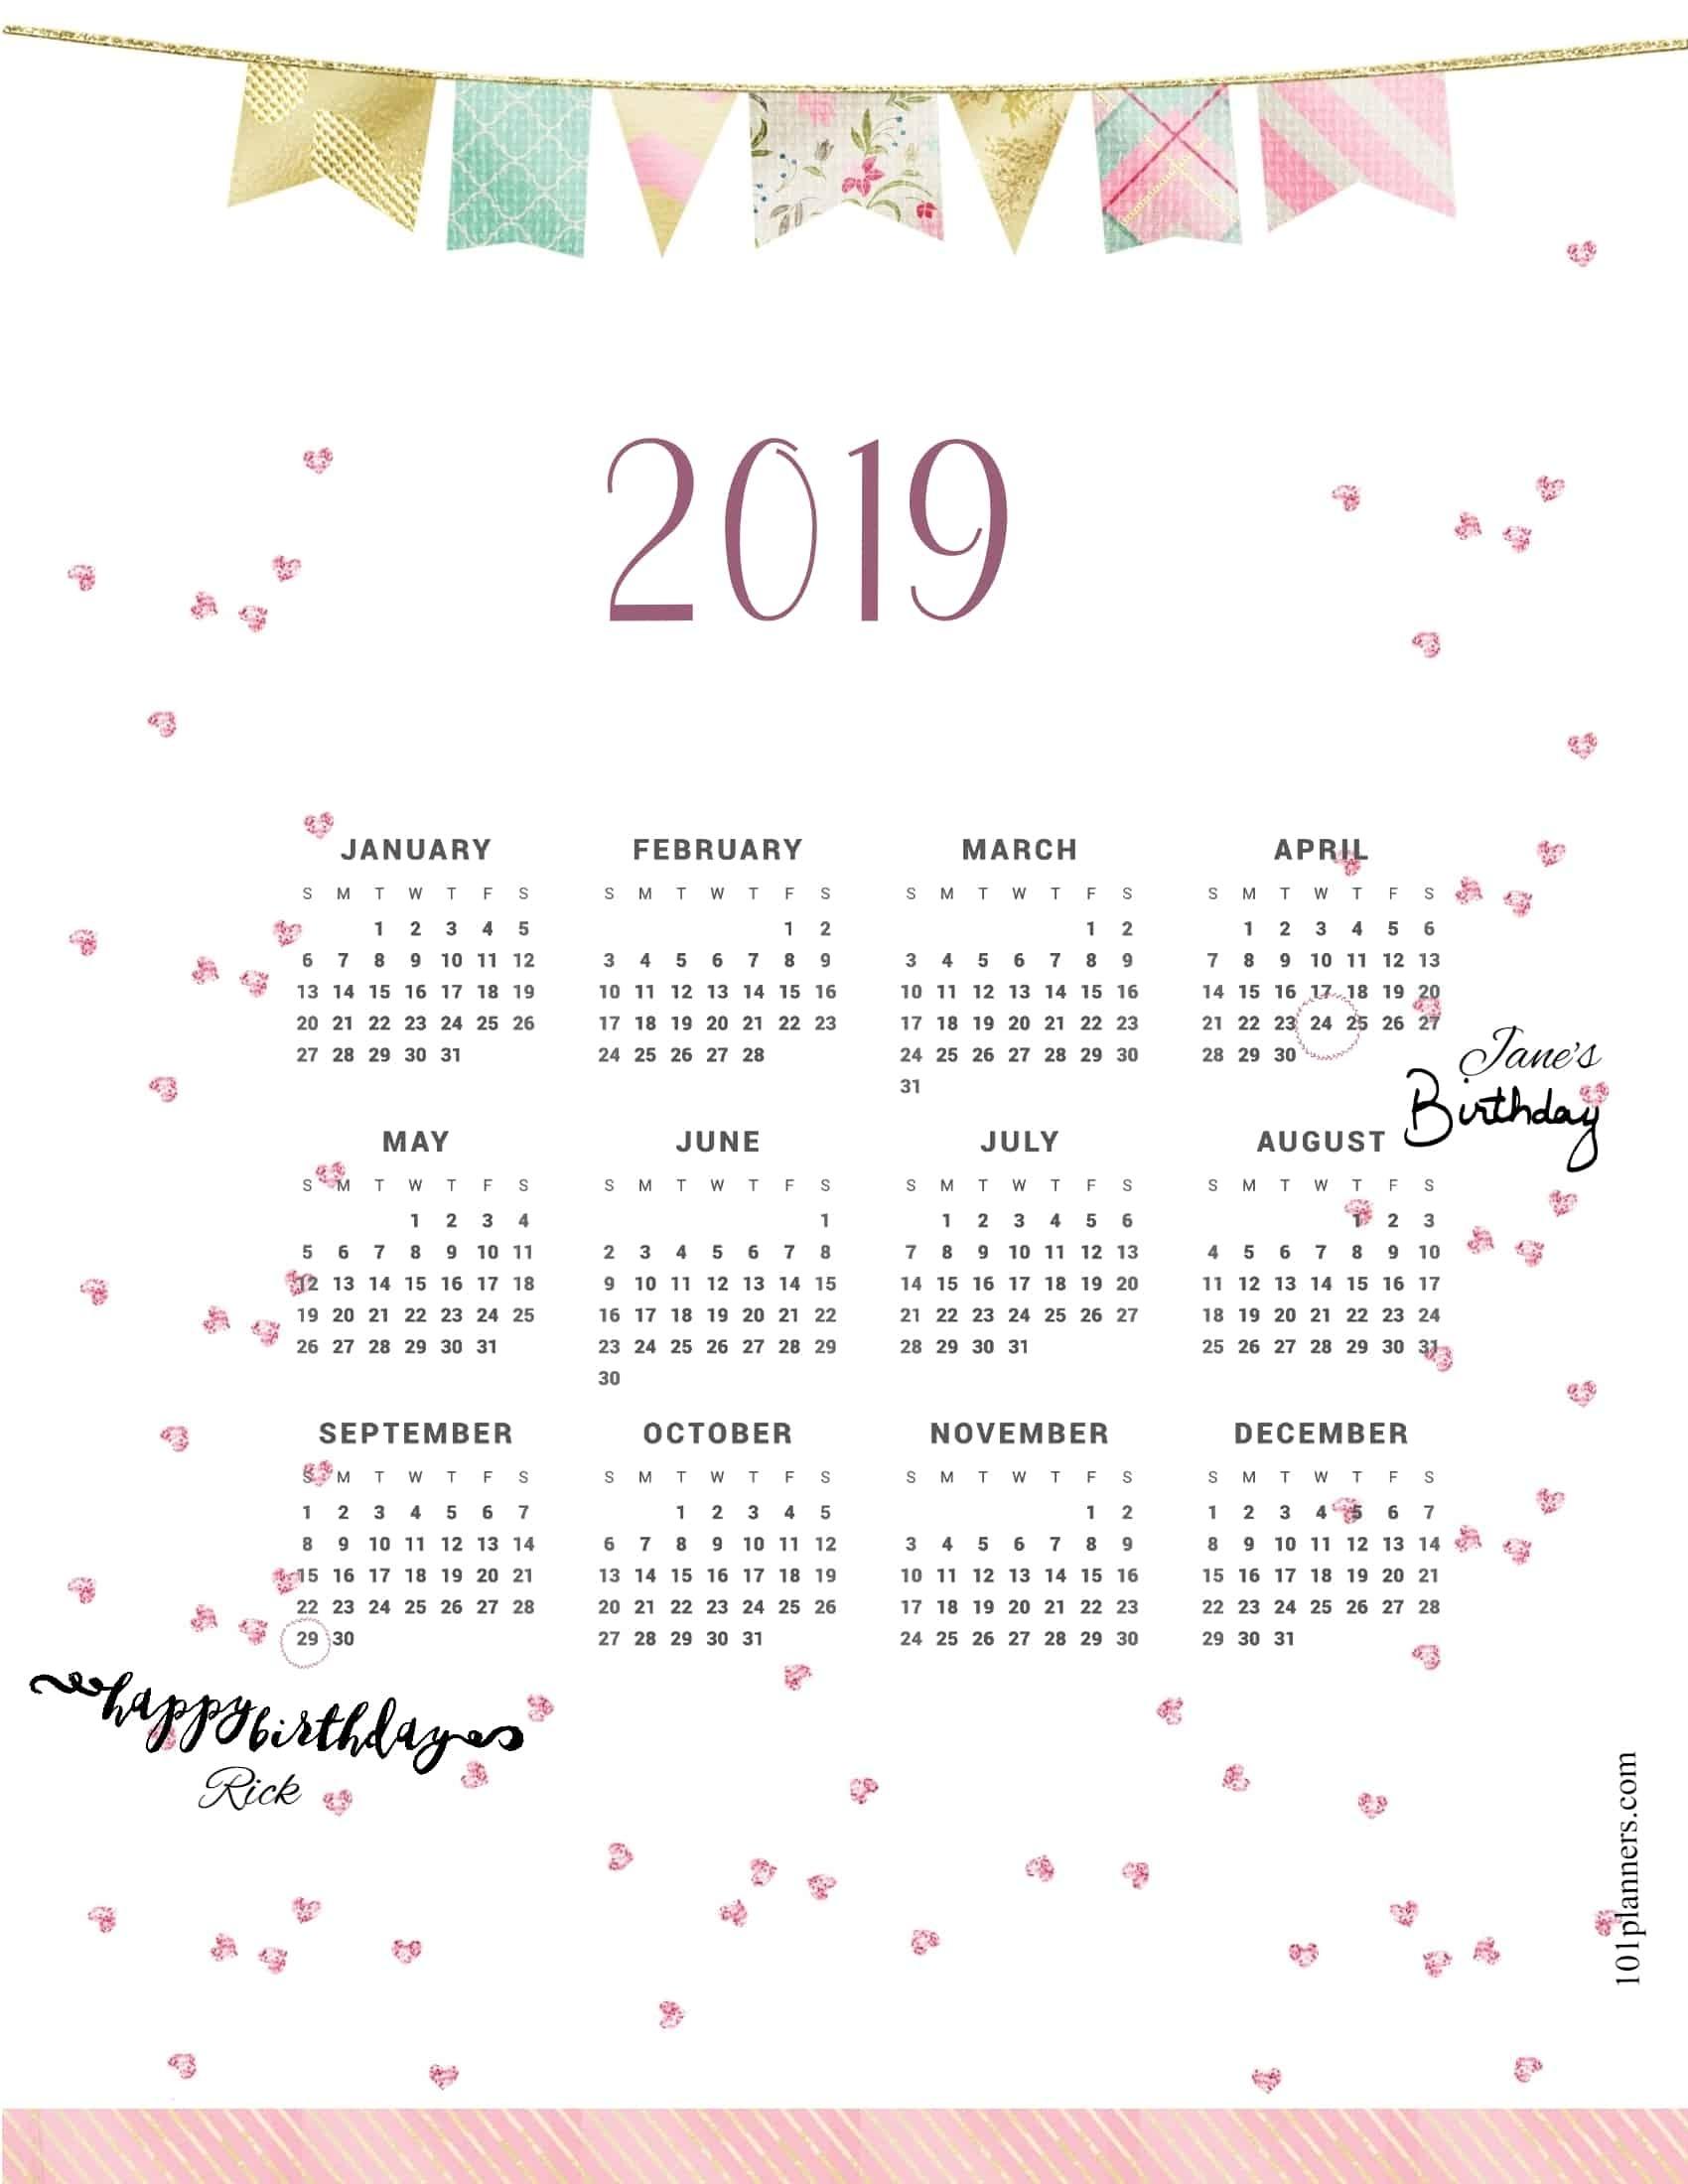 2019 Calendar Impressive Free 2020 Calendar At A Glance